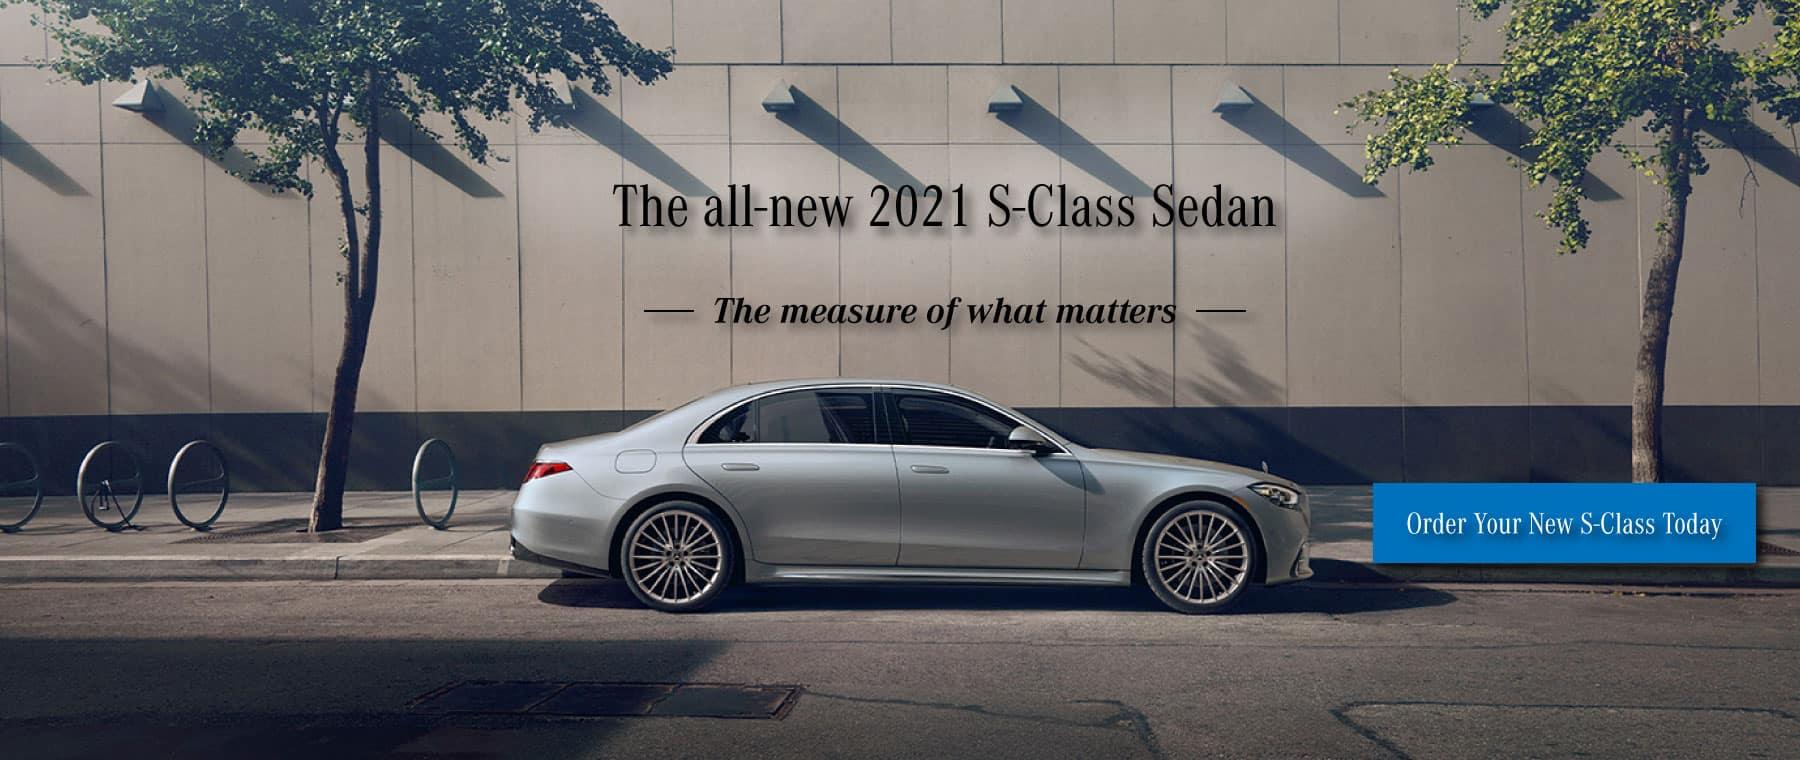 Mercedes-Benz of Beaverton 2021 S-Class Sedan